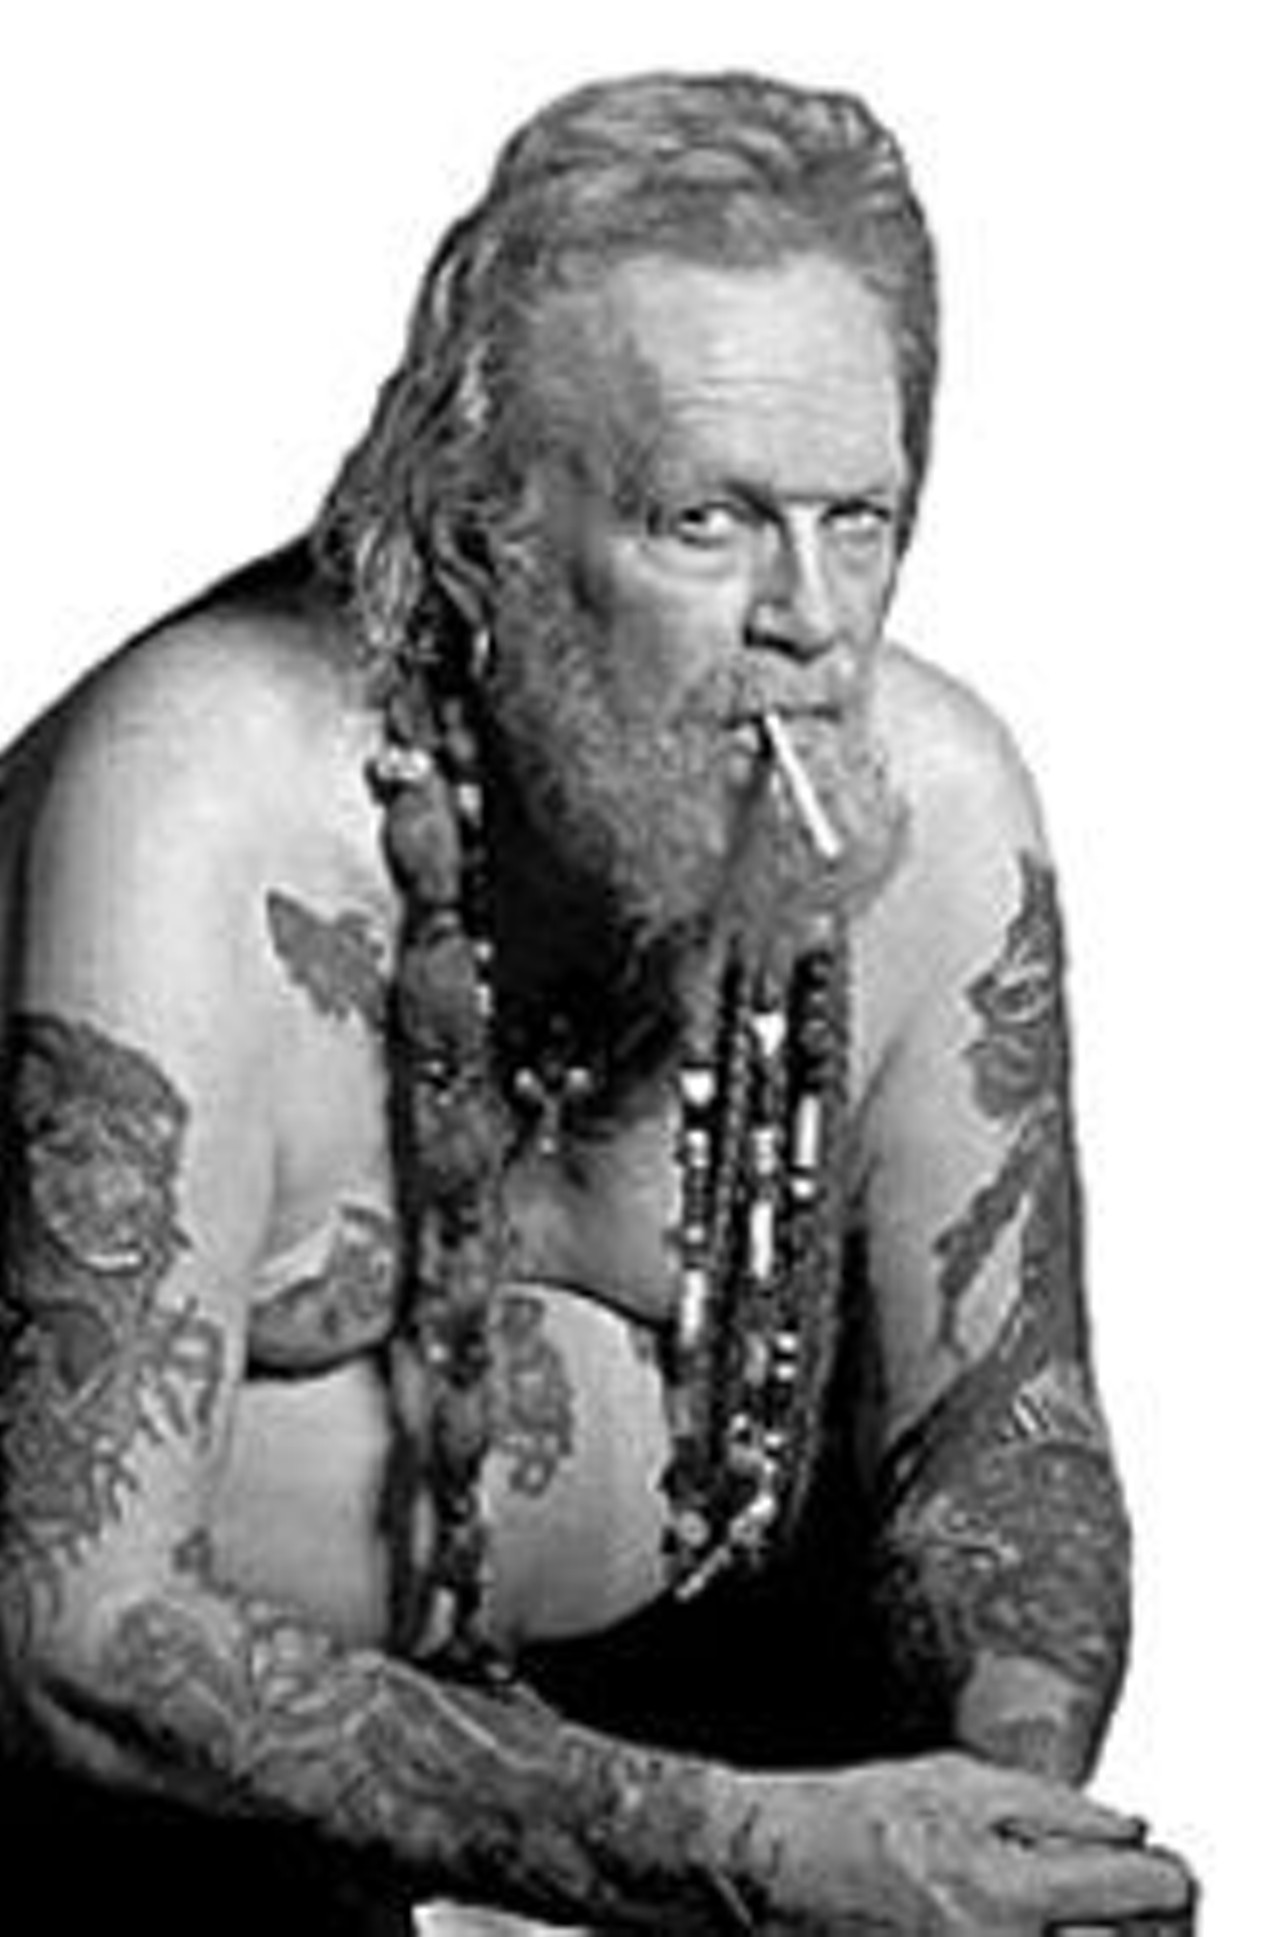 David Allan Coe Tattoo